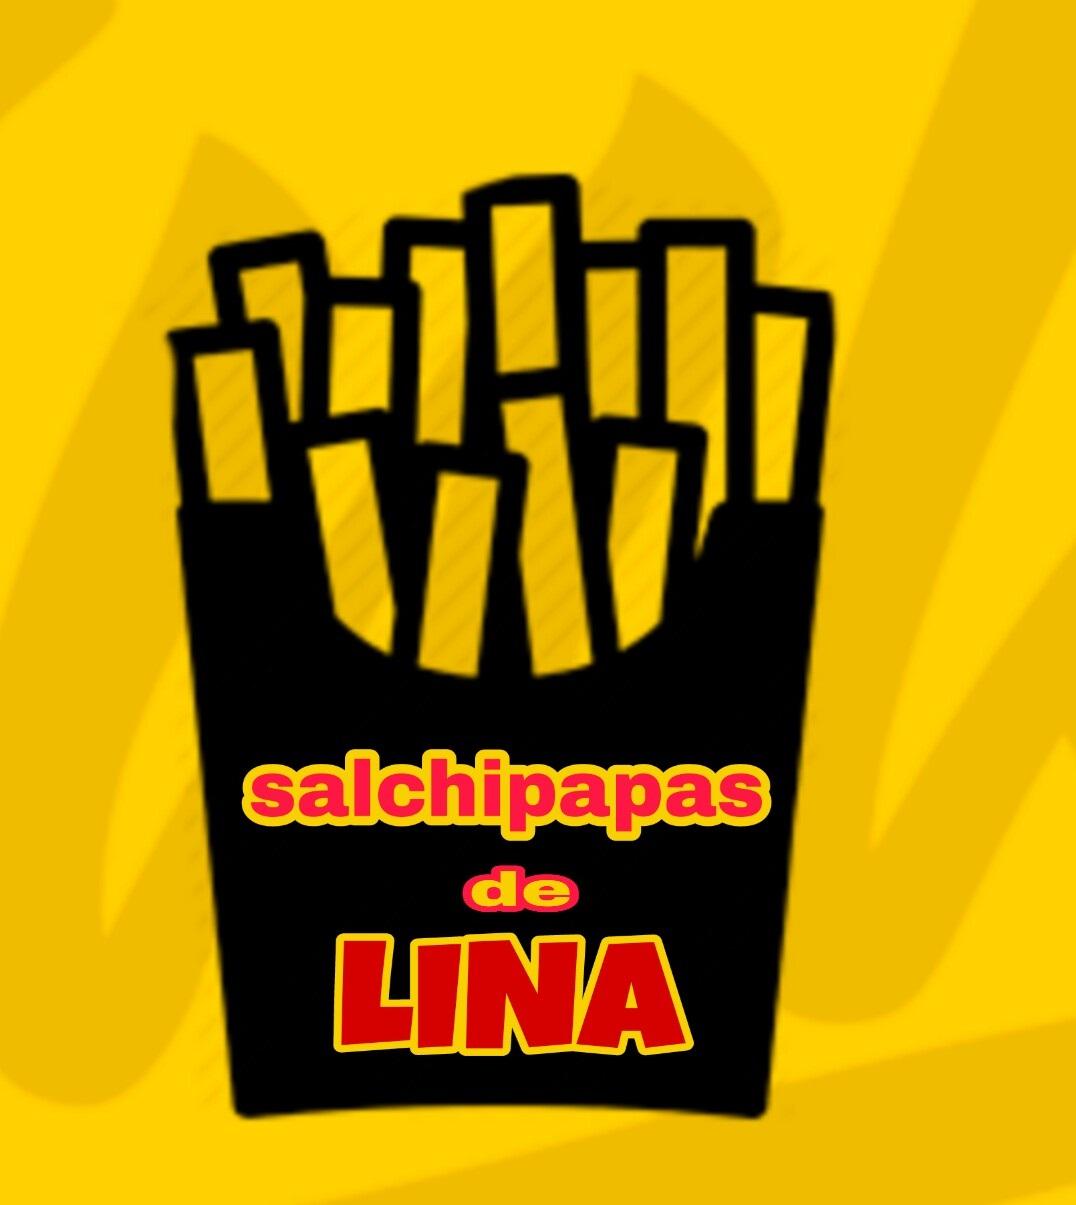 Salchipapas de Lina